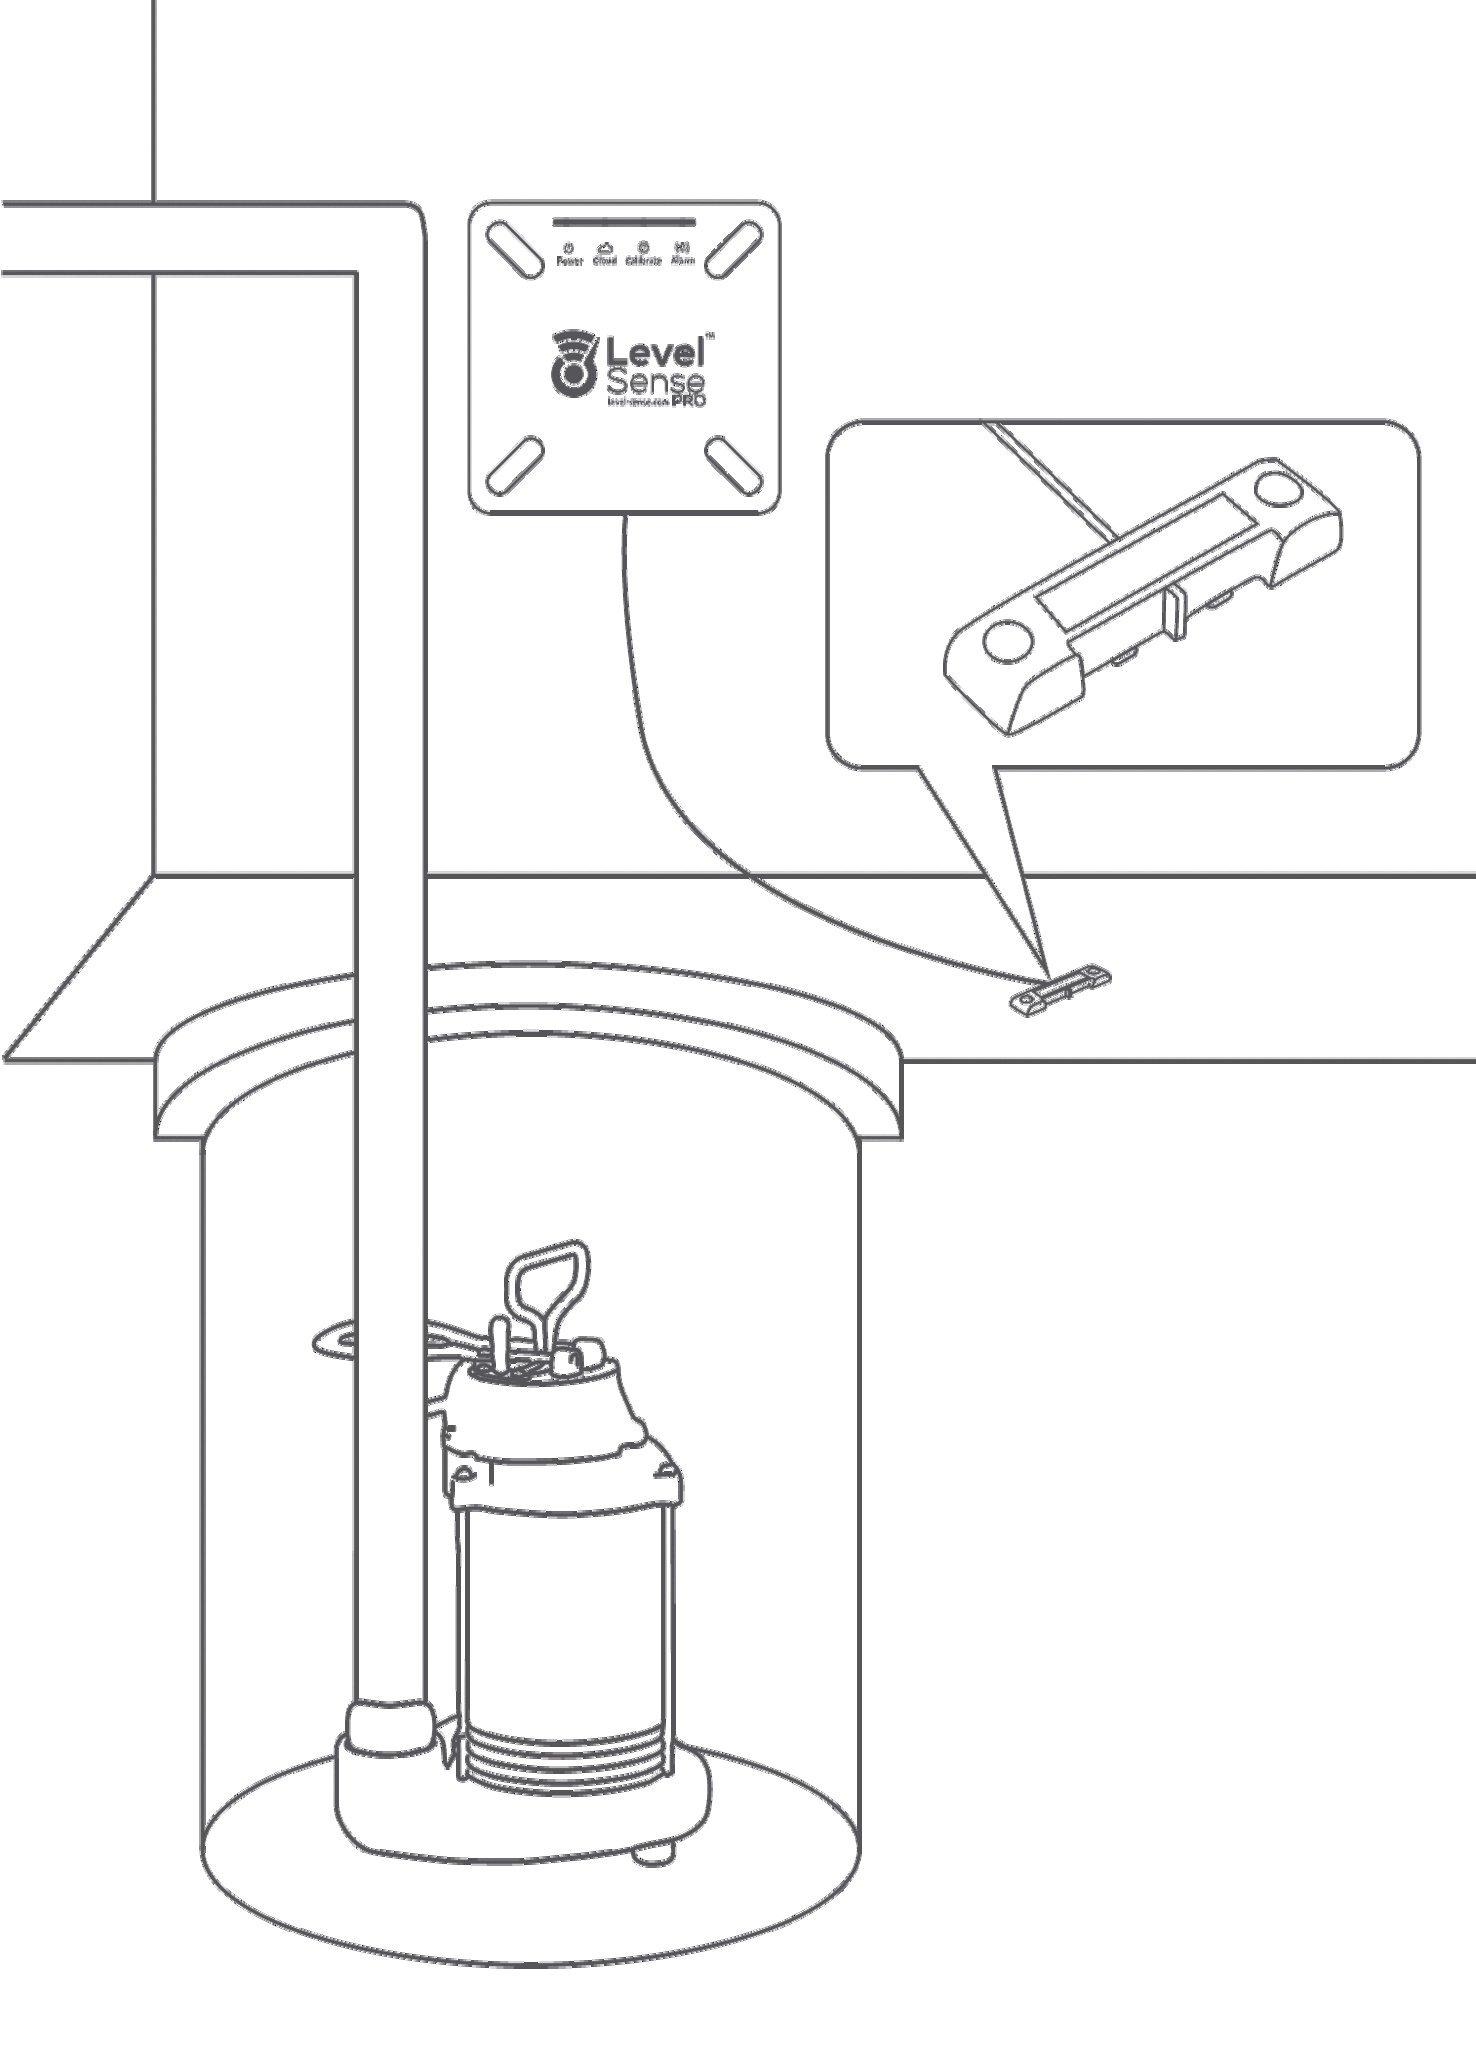 Level Sense PRO- Wi-Fi Enabled Sump Pump, Temperature, Humidity, and Leak Detector